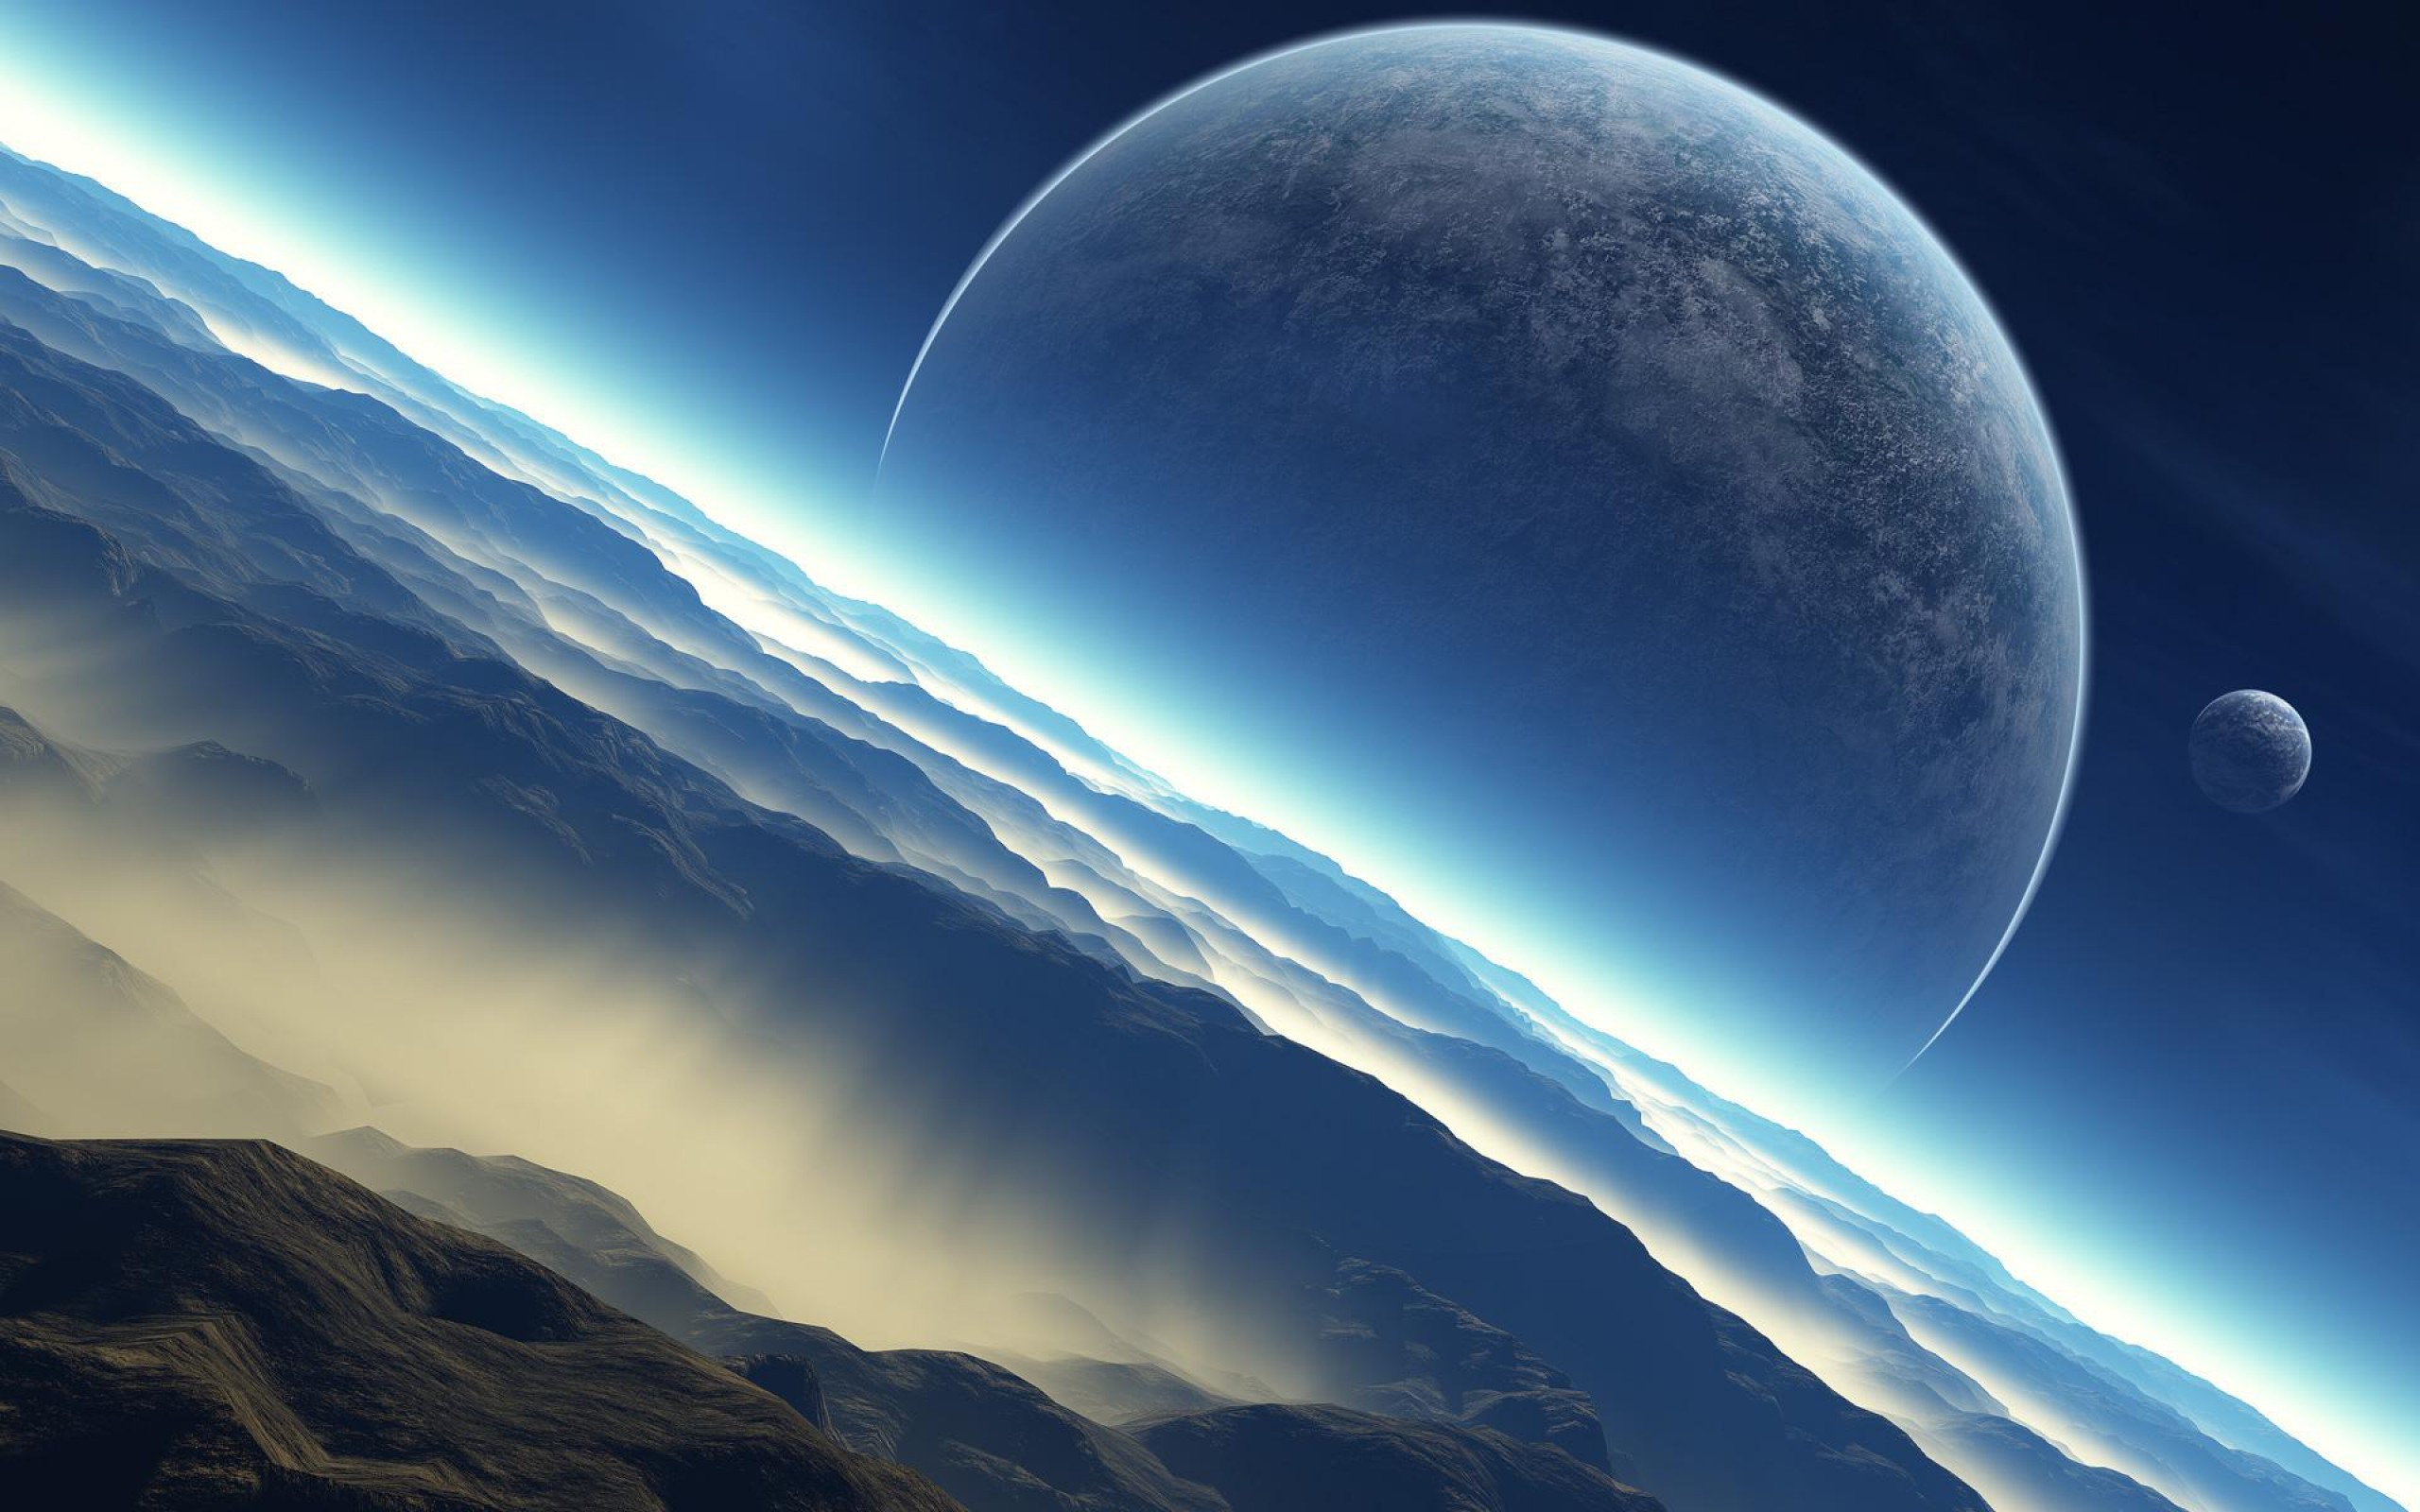 3d Space Background Wallpaper: 3D Universe Wallpaper (59+ Images